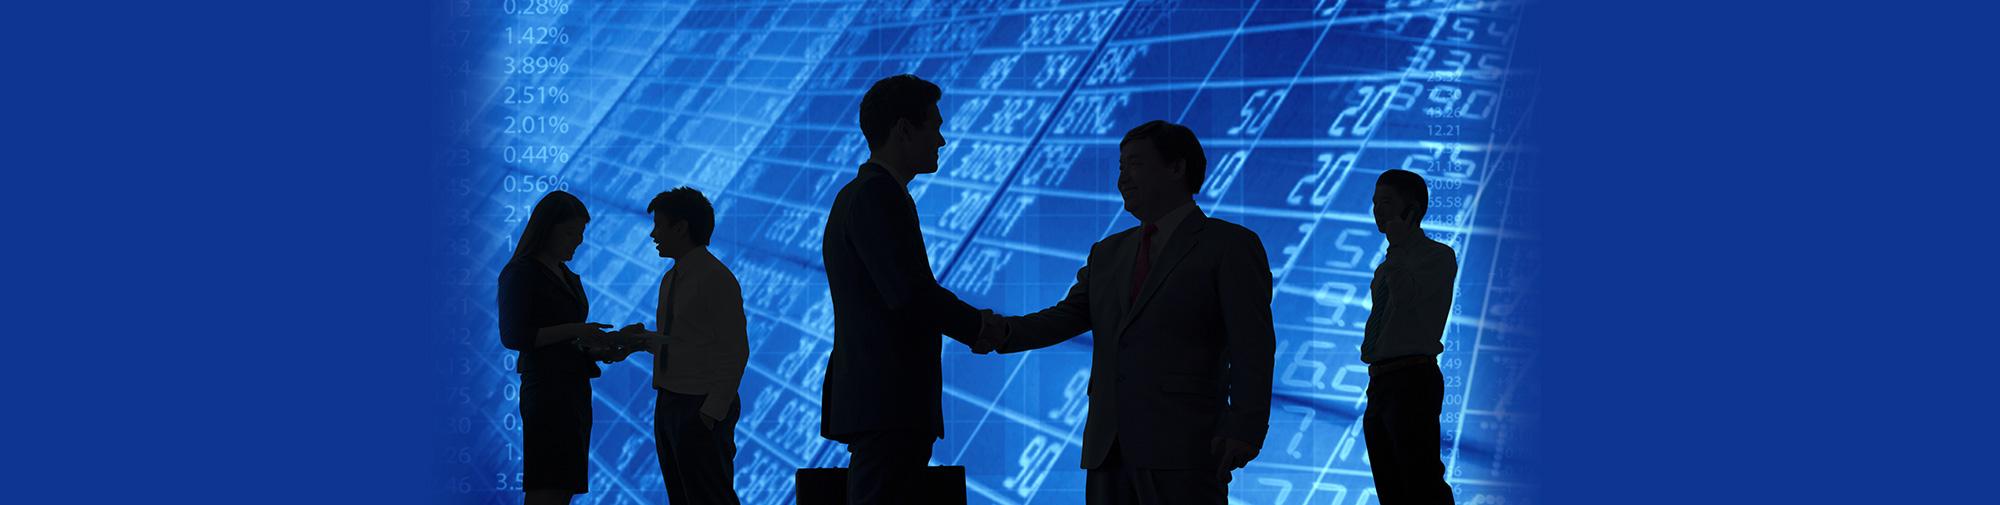 https://www.gekterna.com/userfiles/11e3ebfa-92f9-4083-8c5b-a26d00fe9b3c/Investor_Relations2.jpg